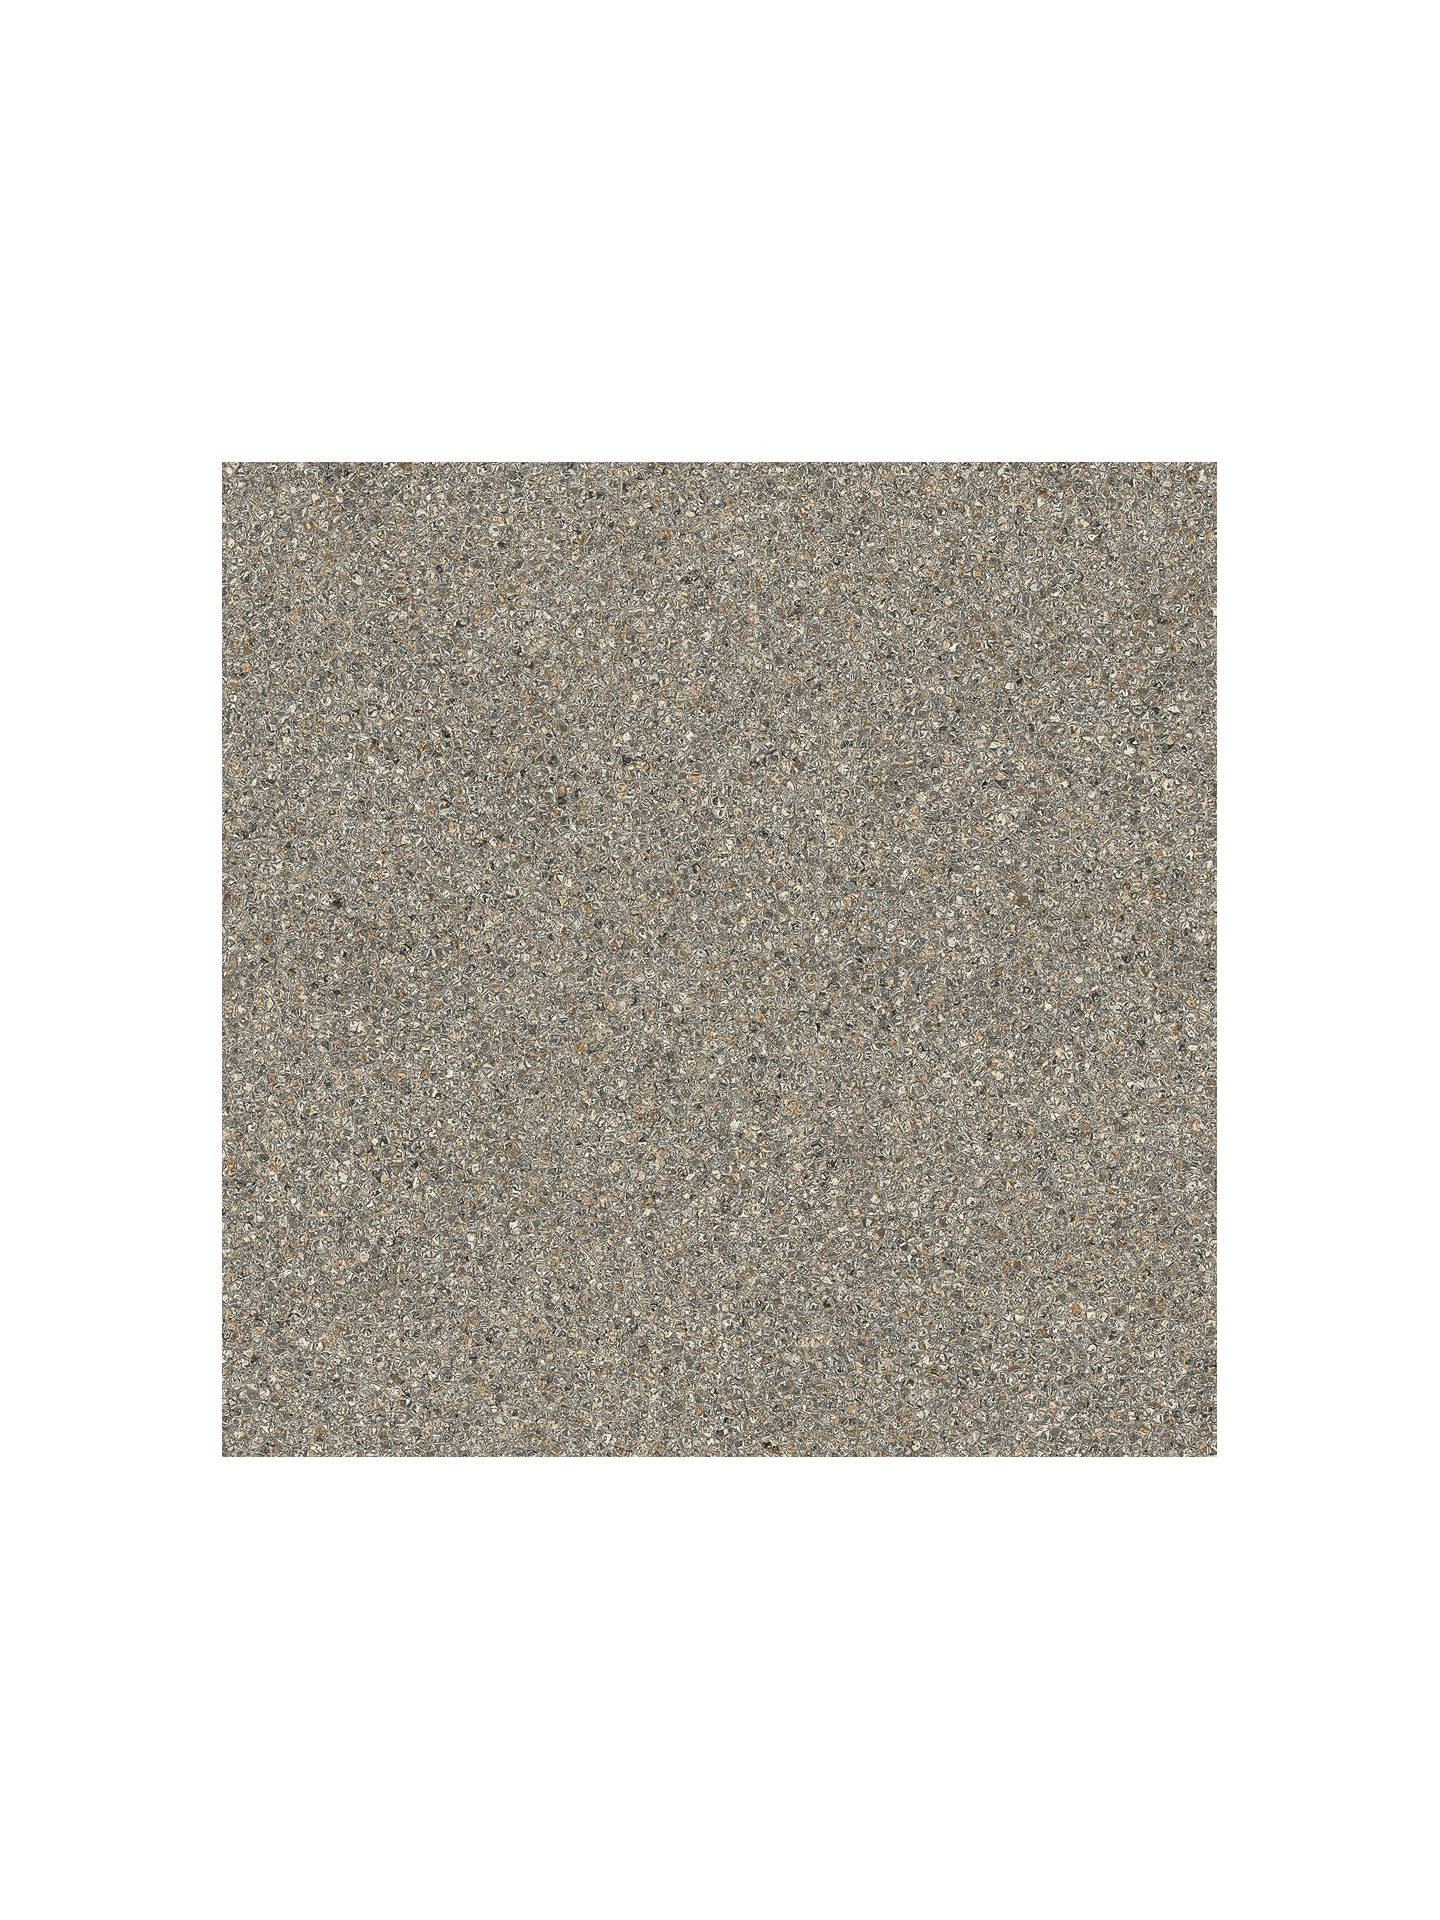 john lewis partners smooth ultimate 20 vinyl flooring at john lewis partners. Black Bedroom Furniture Sets. Home Design Ideas